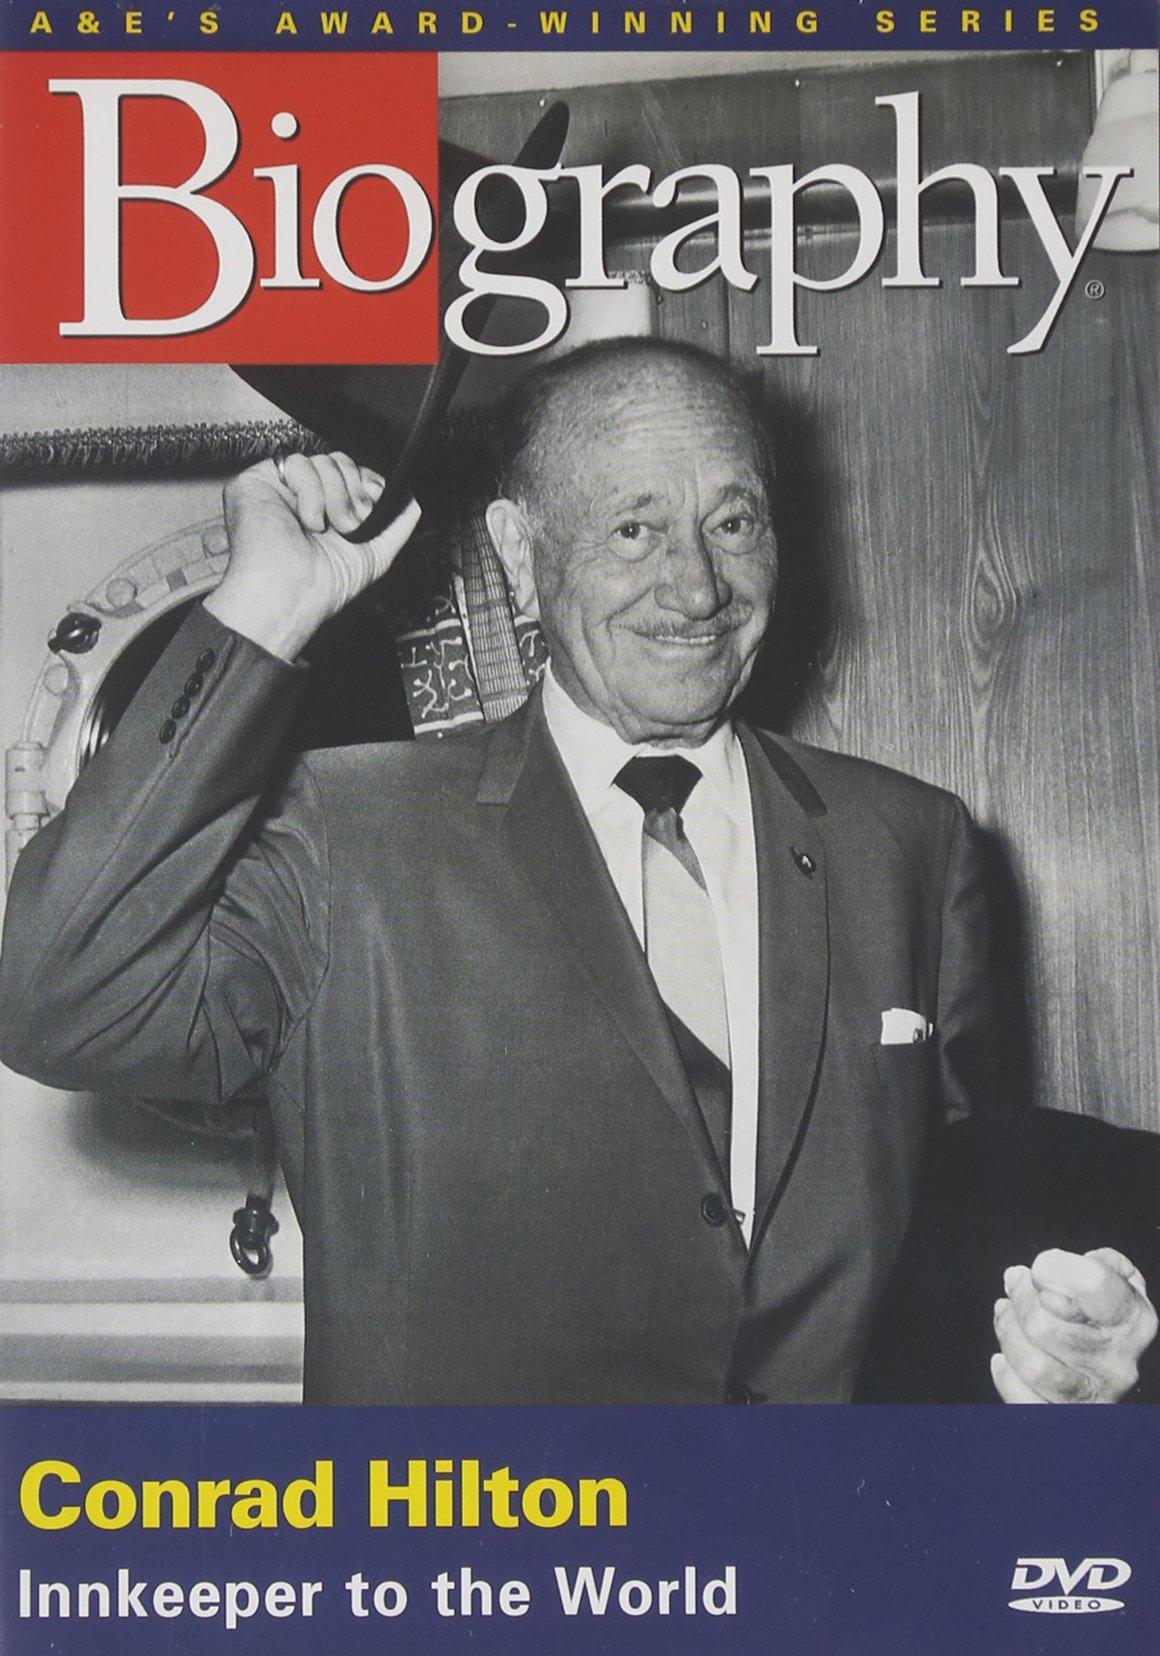 Biography - Conrad Hilton: Innkeeper to the World